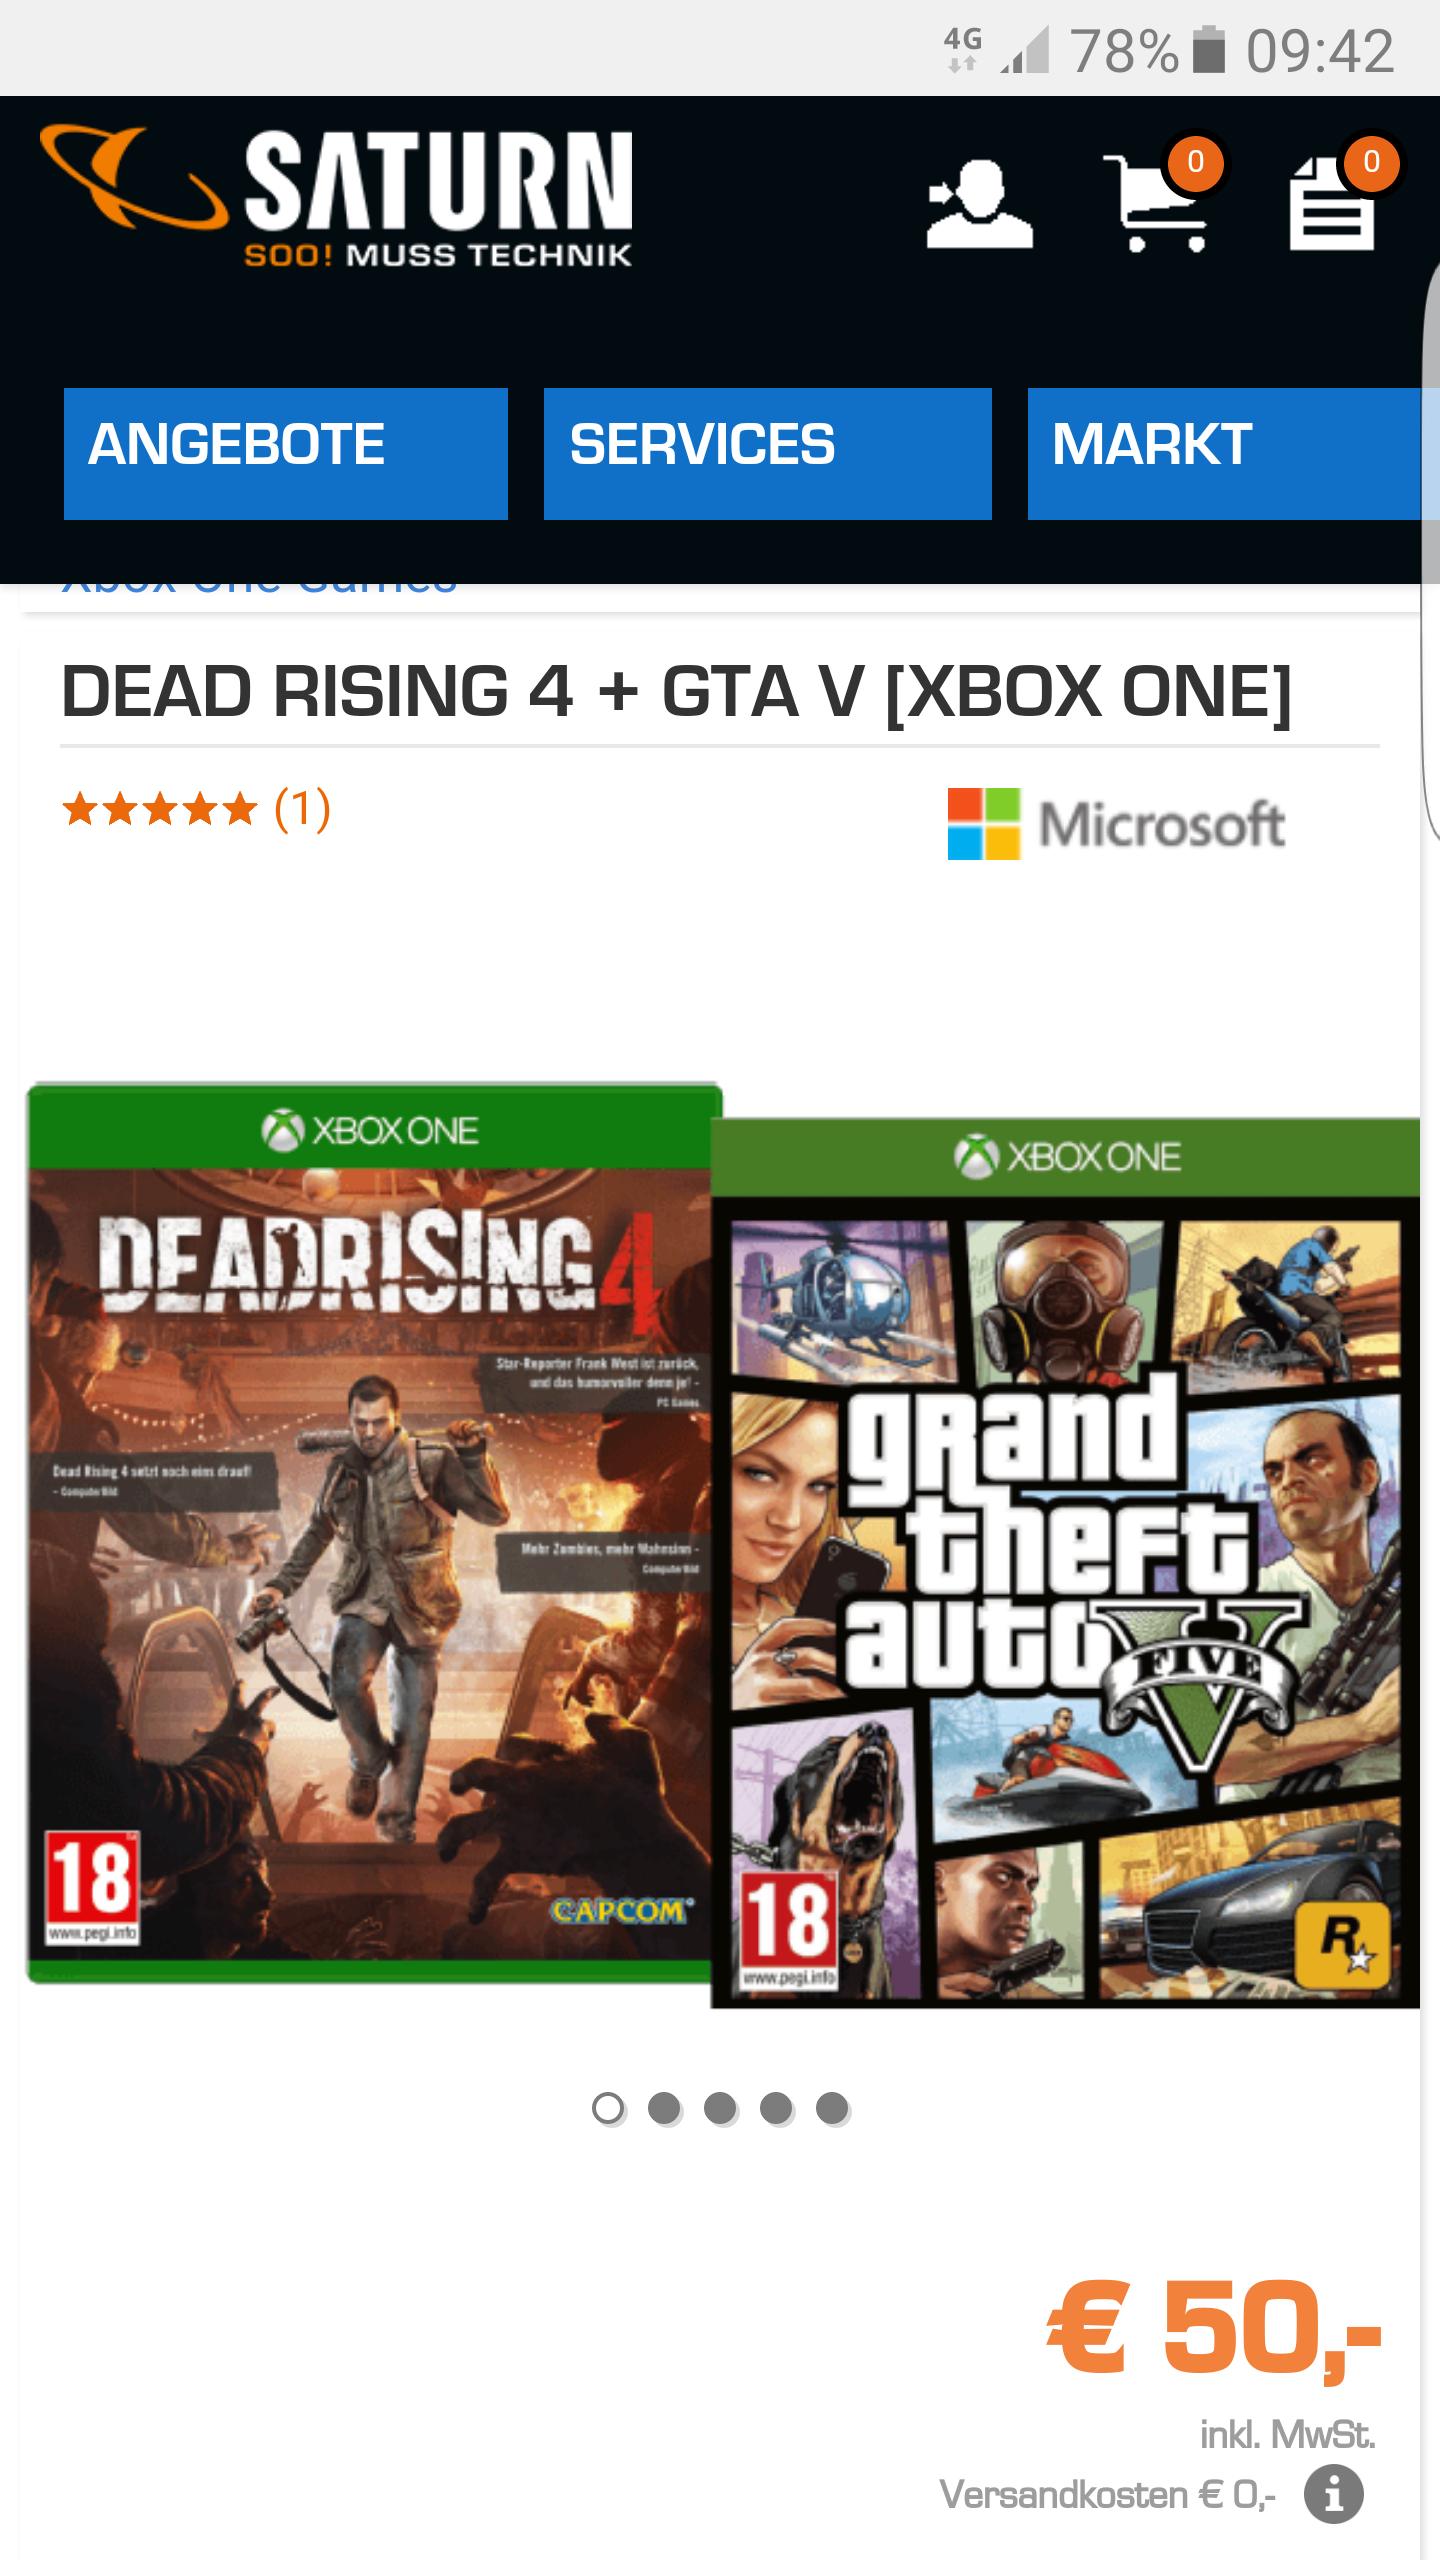 DEAD RISING 4 + GTA V [XBOX ONE] für 50 Euro inkl.versand